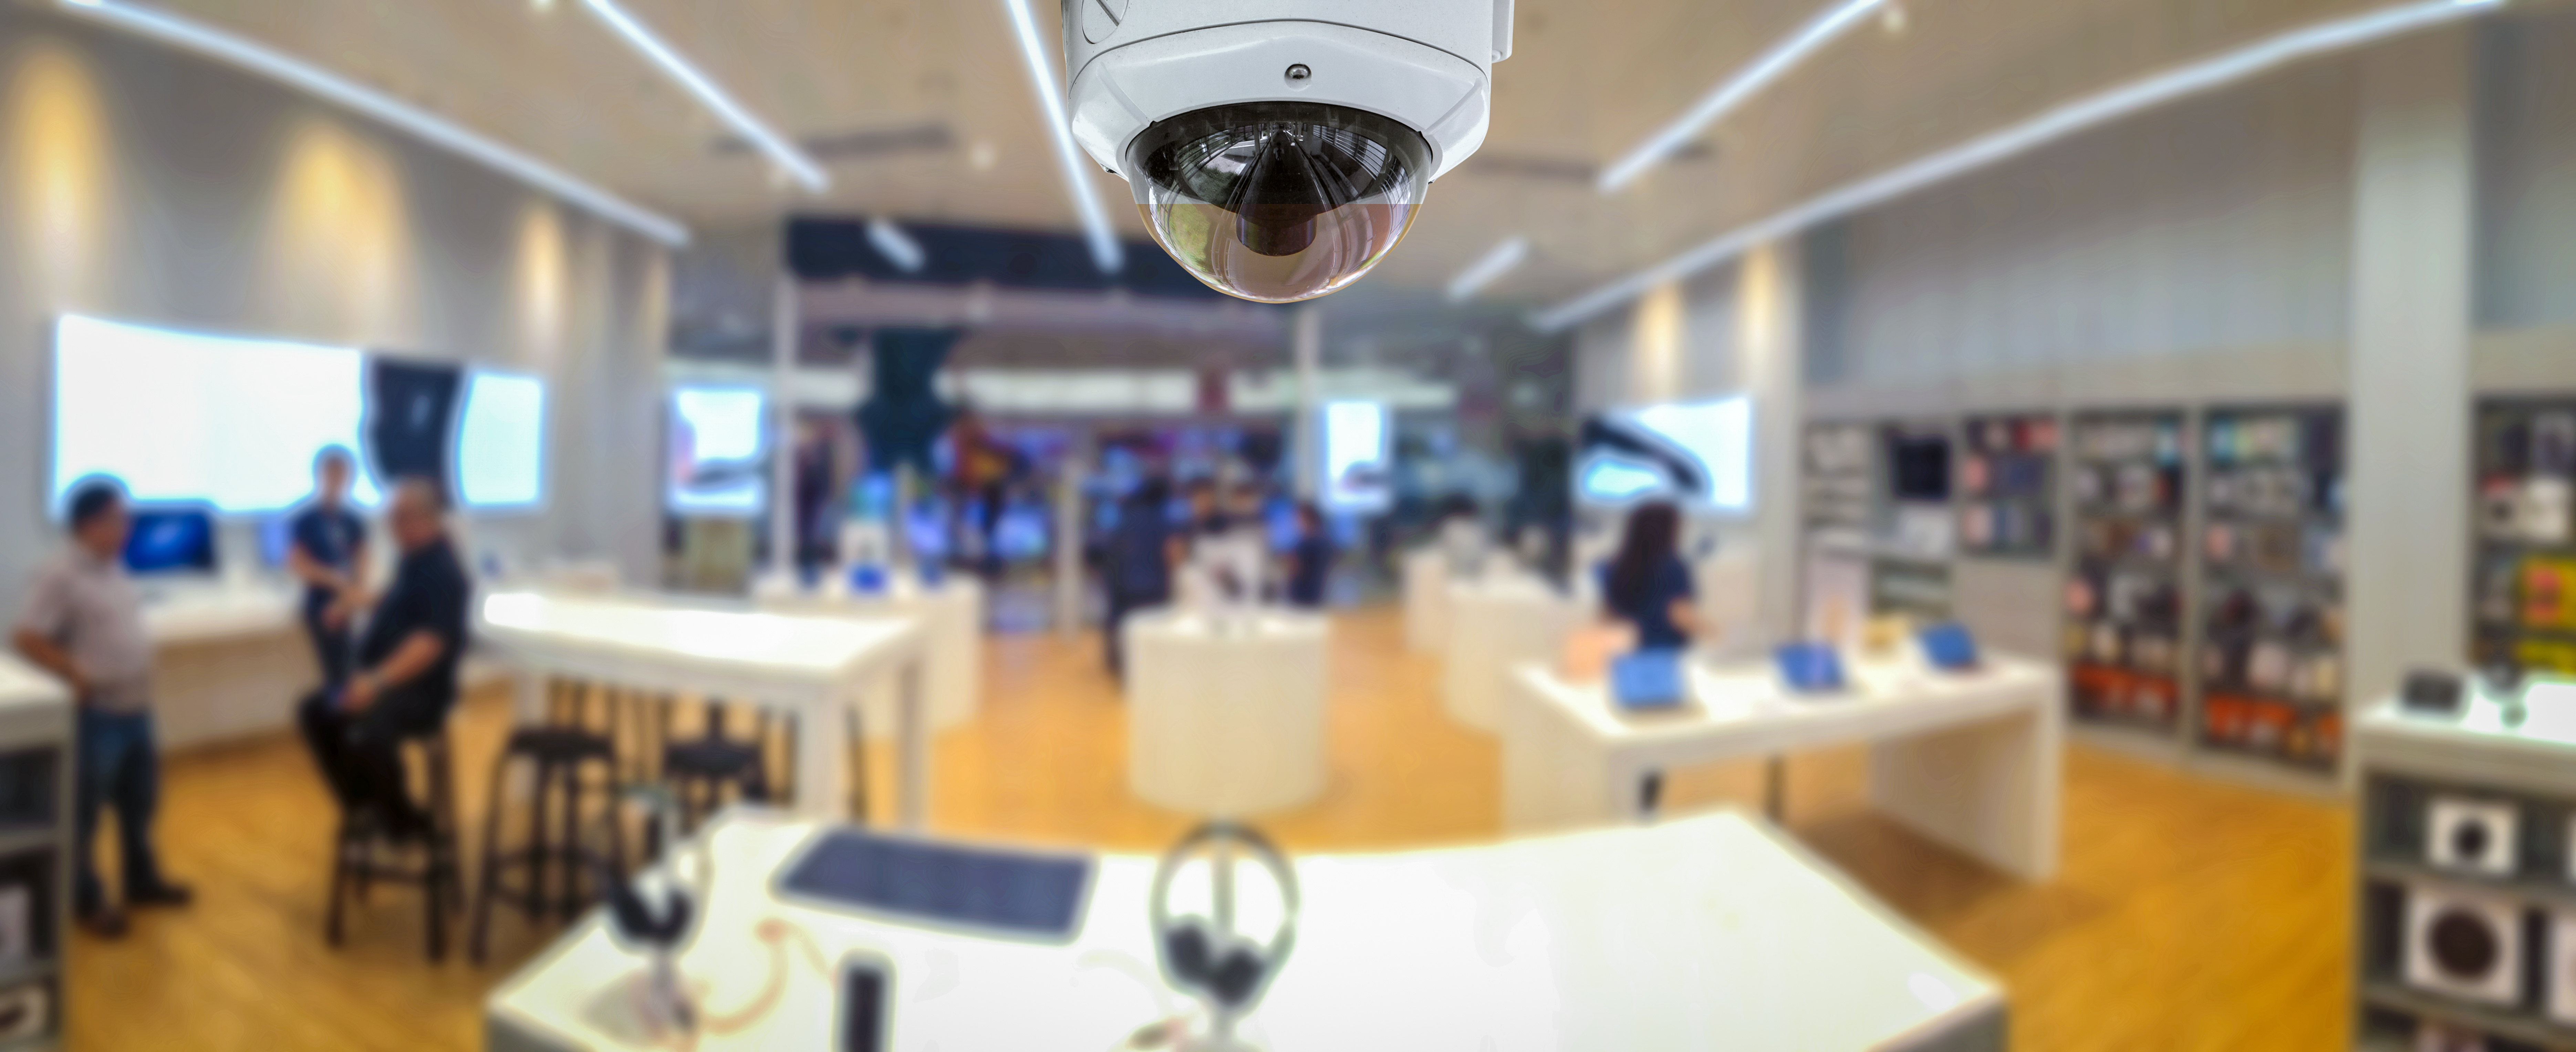 Security cameras for dispensaries